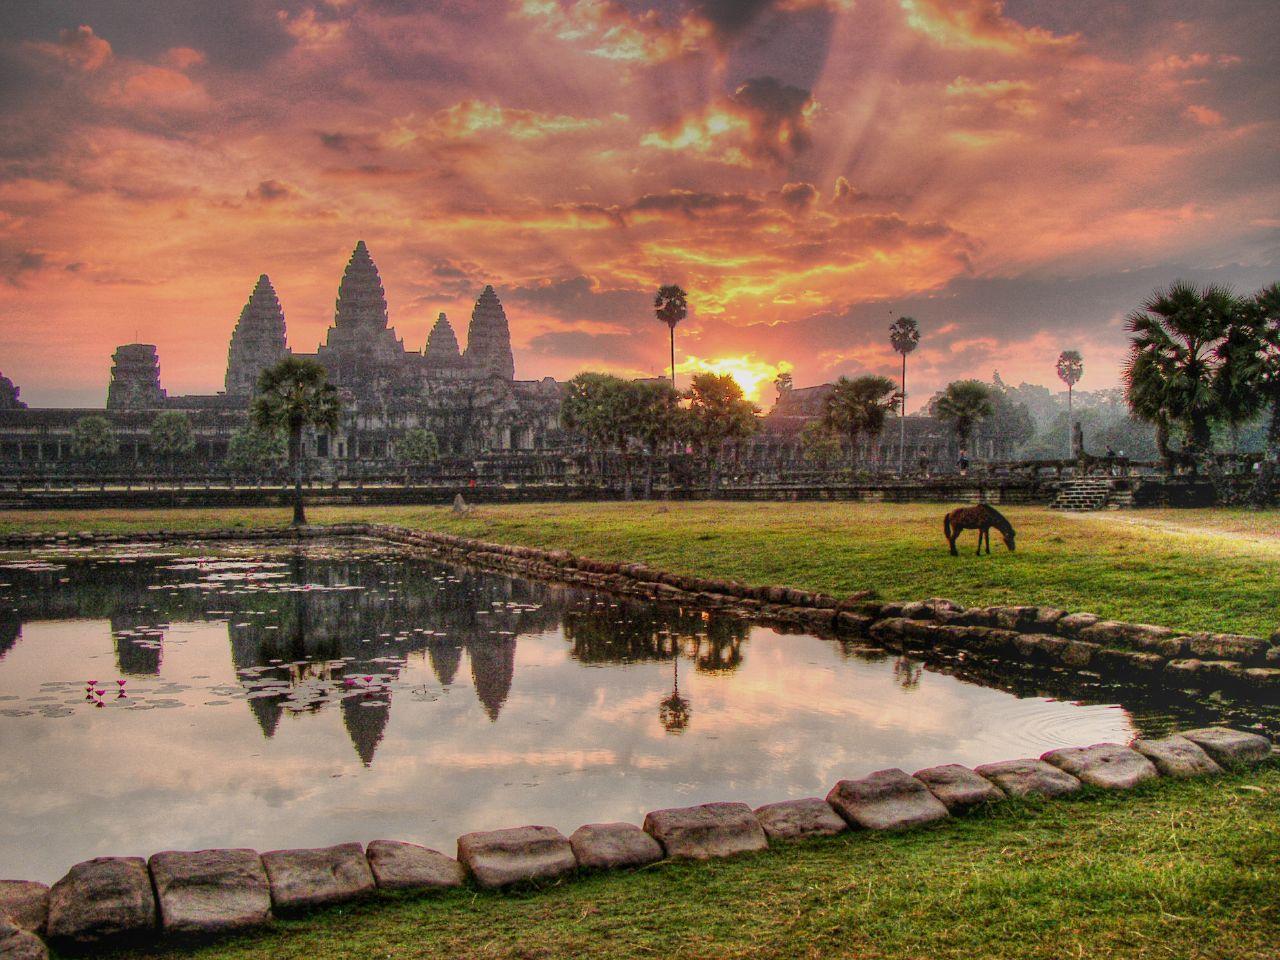 angkor-wat-wonder-of-the-world-cambodia-secret-world